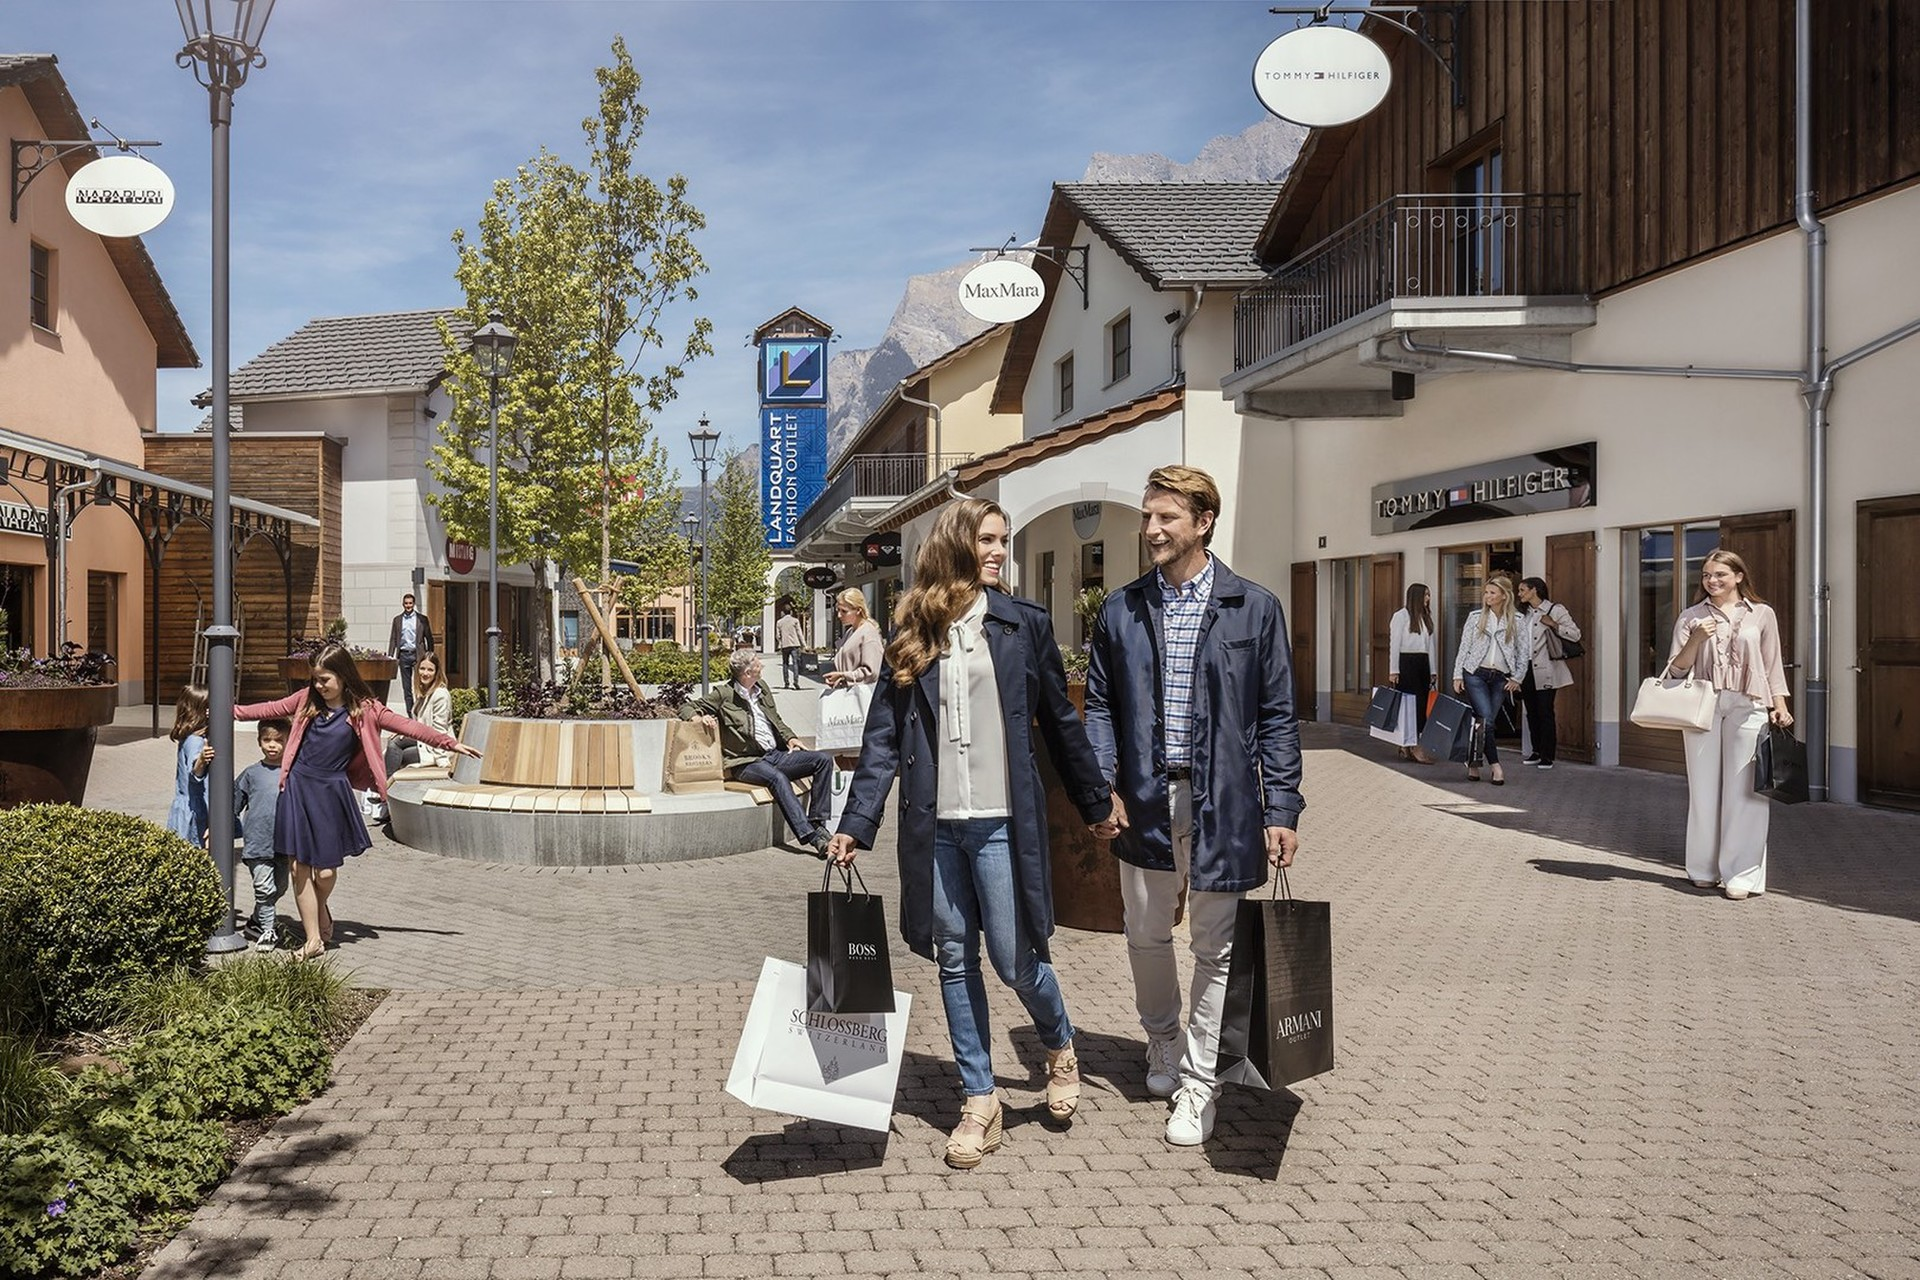 Landquart Fashion Outlet - VIA Outlets